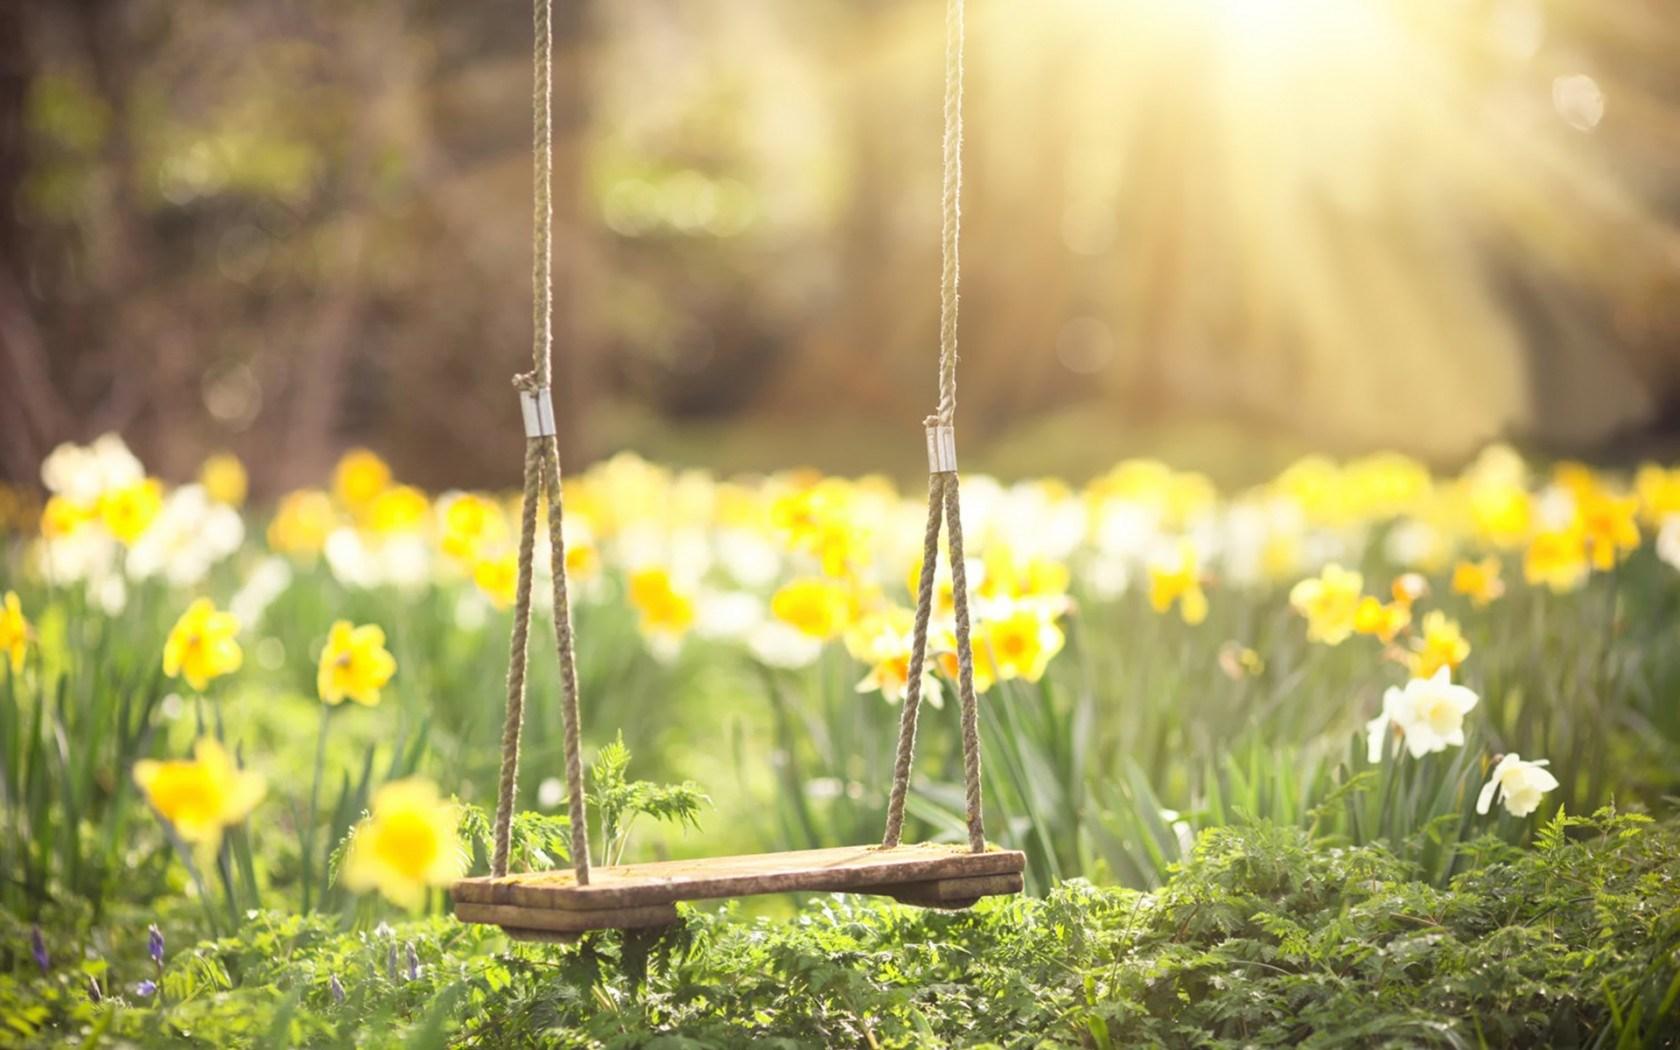 Spring Daffodils Flowers Swing HD Wallpaper